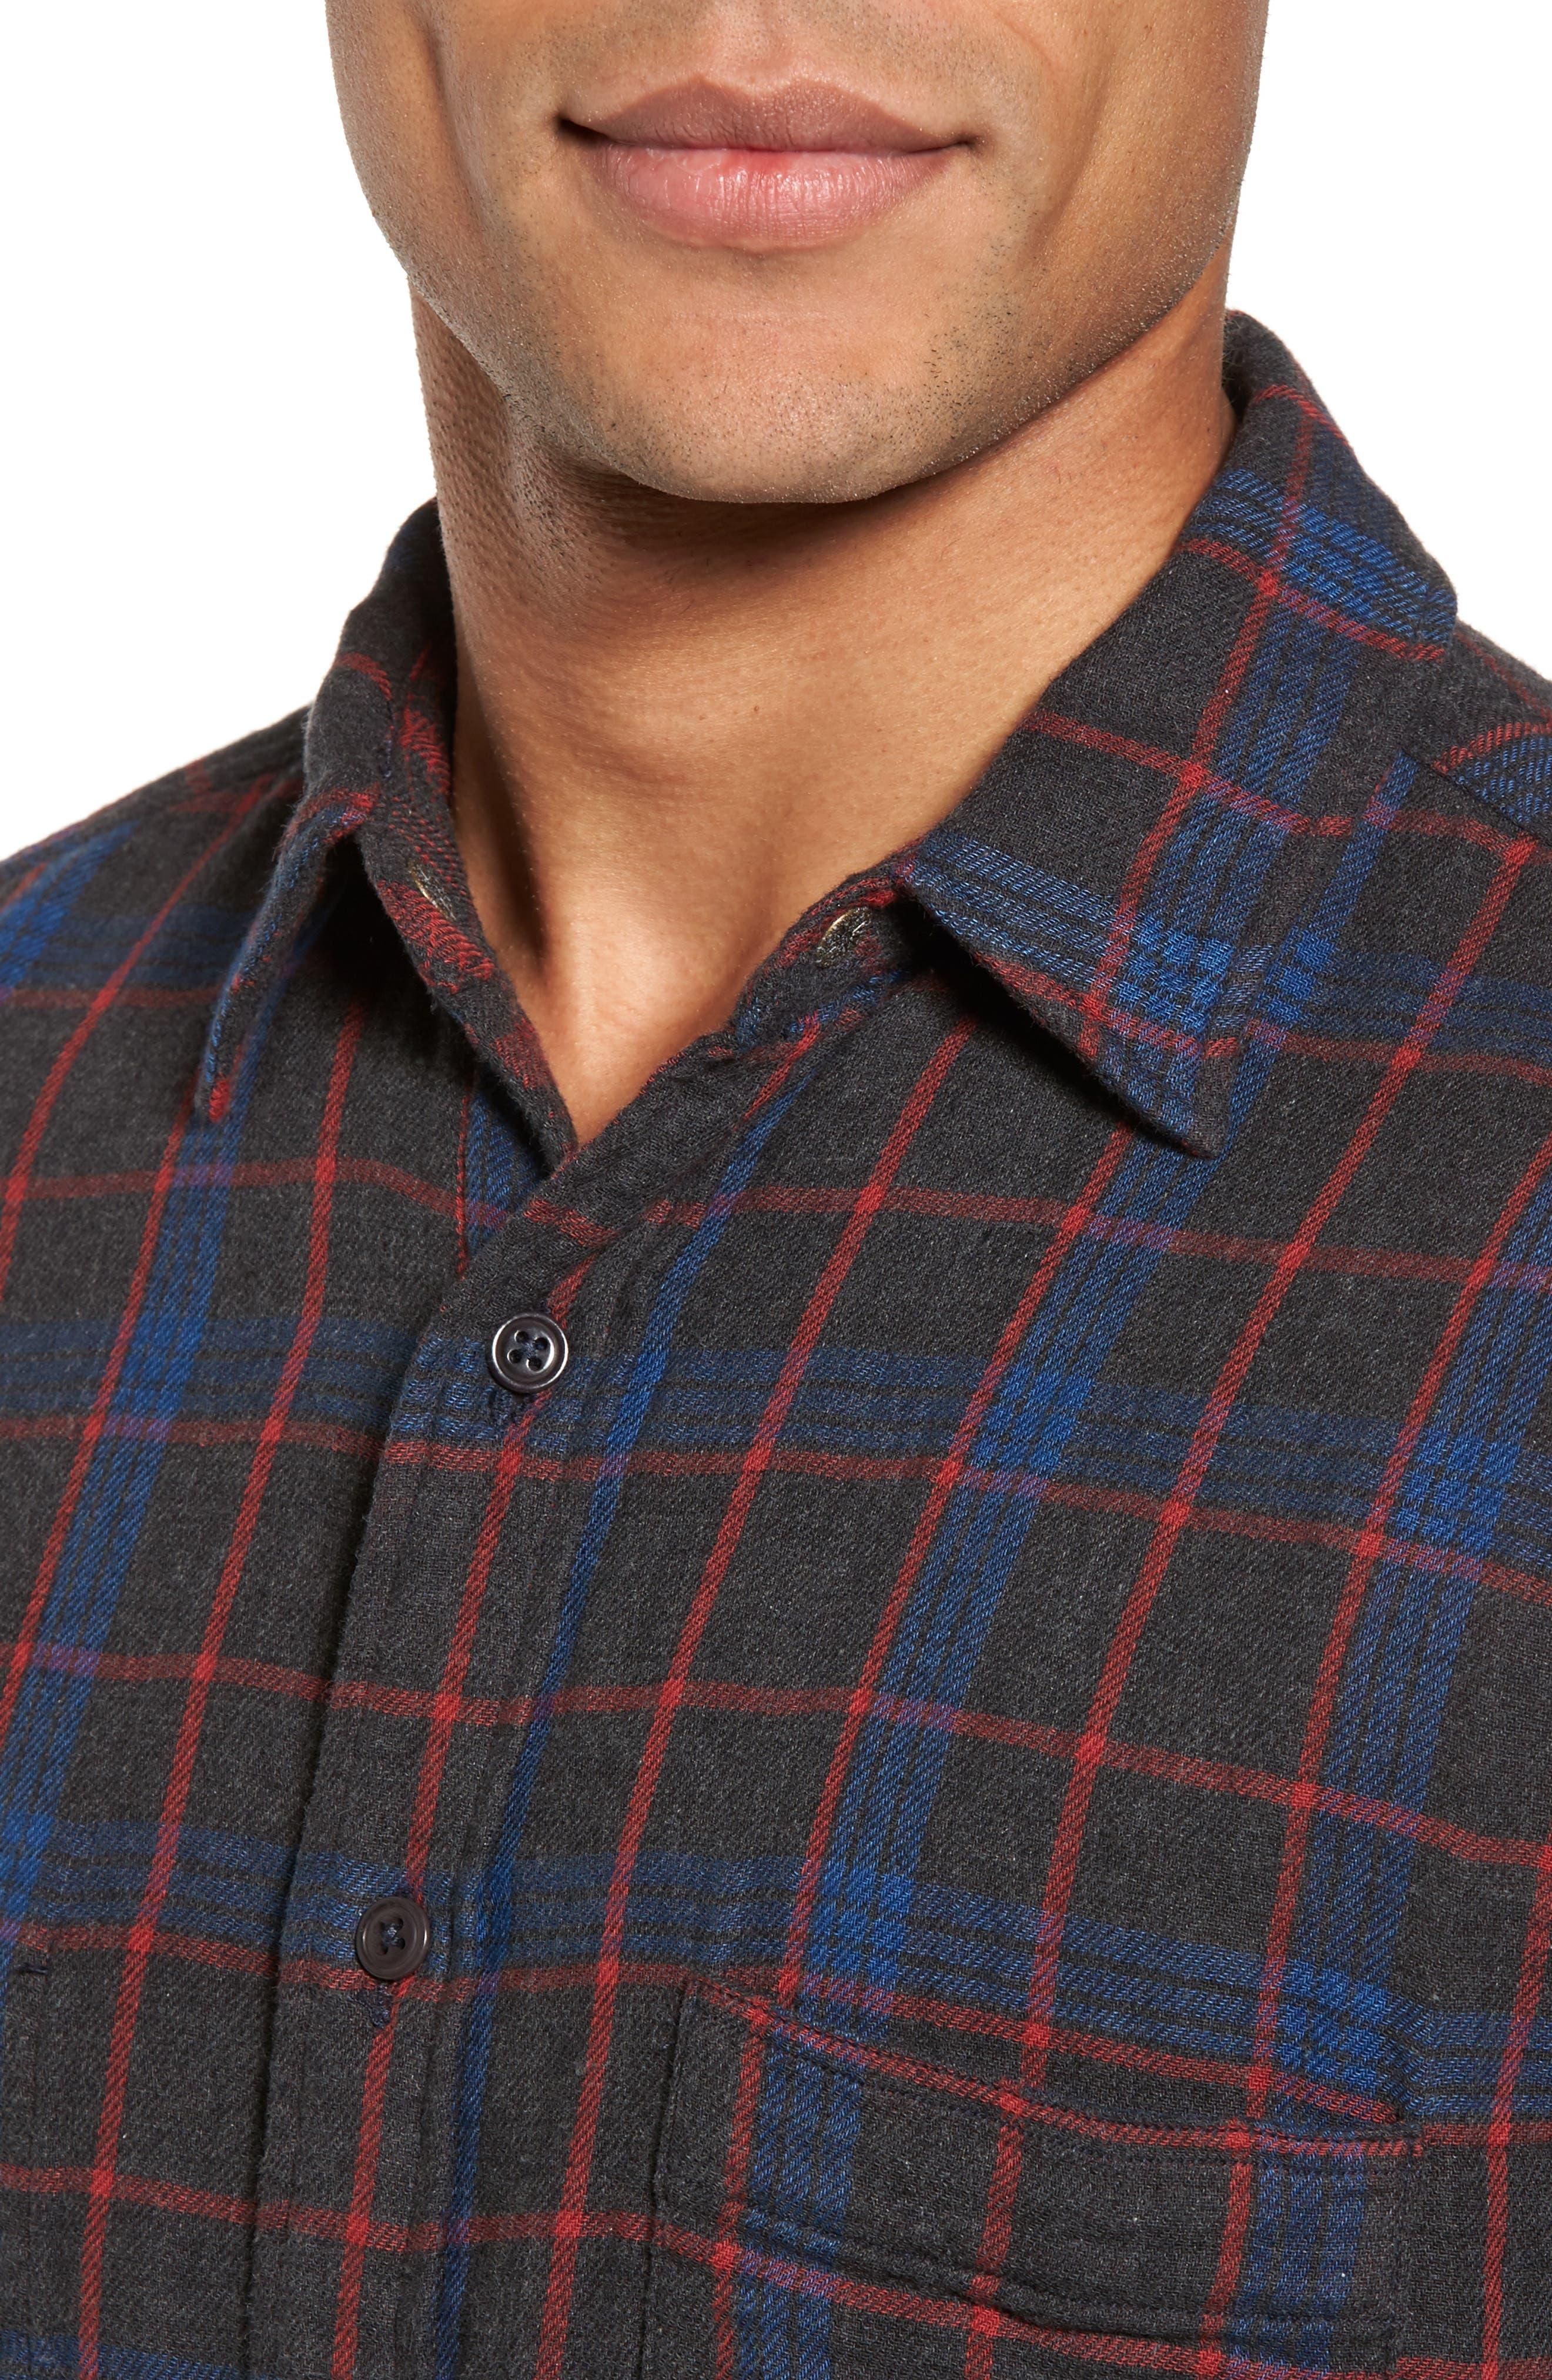 Belmar Plaid Reversible Sport Shirt,                             Alternate thumbnail 5, color,                             Charcoal Blue Red Plaid